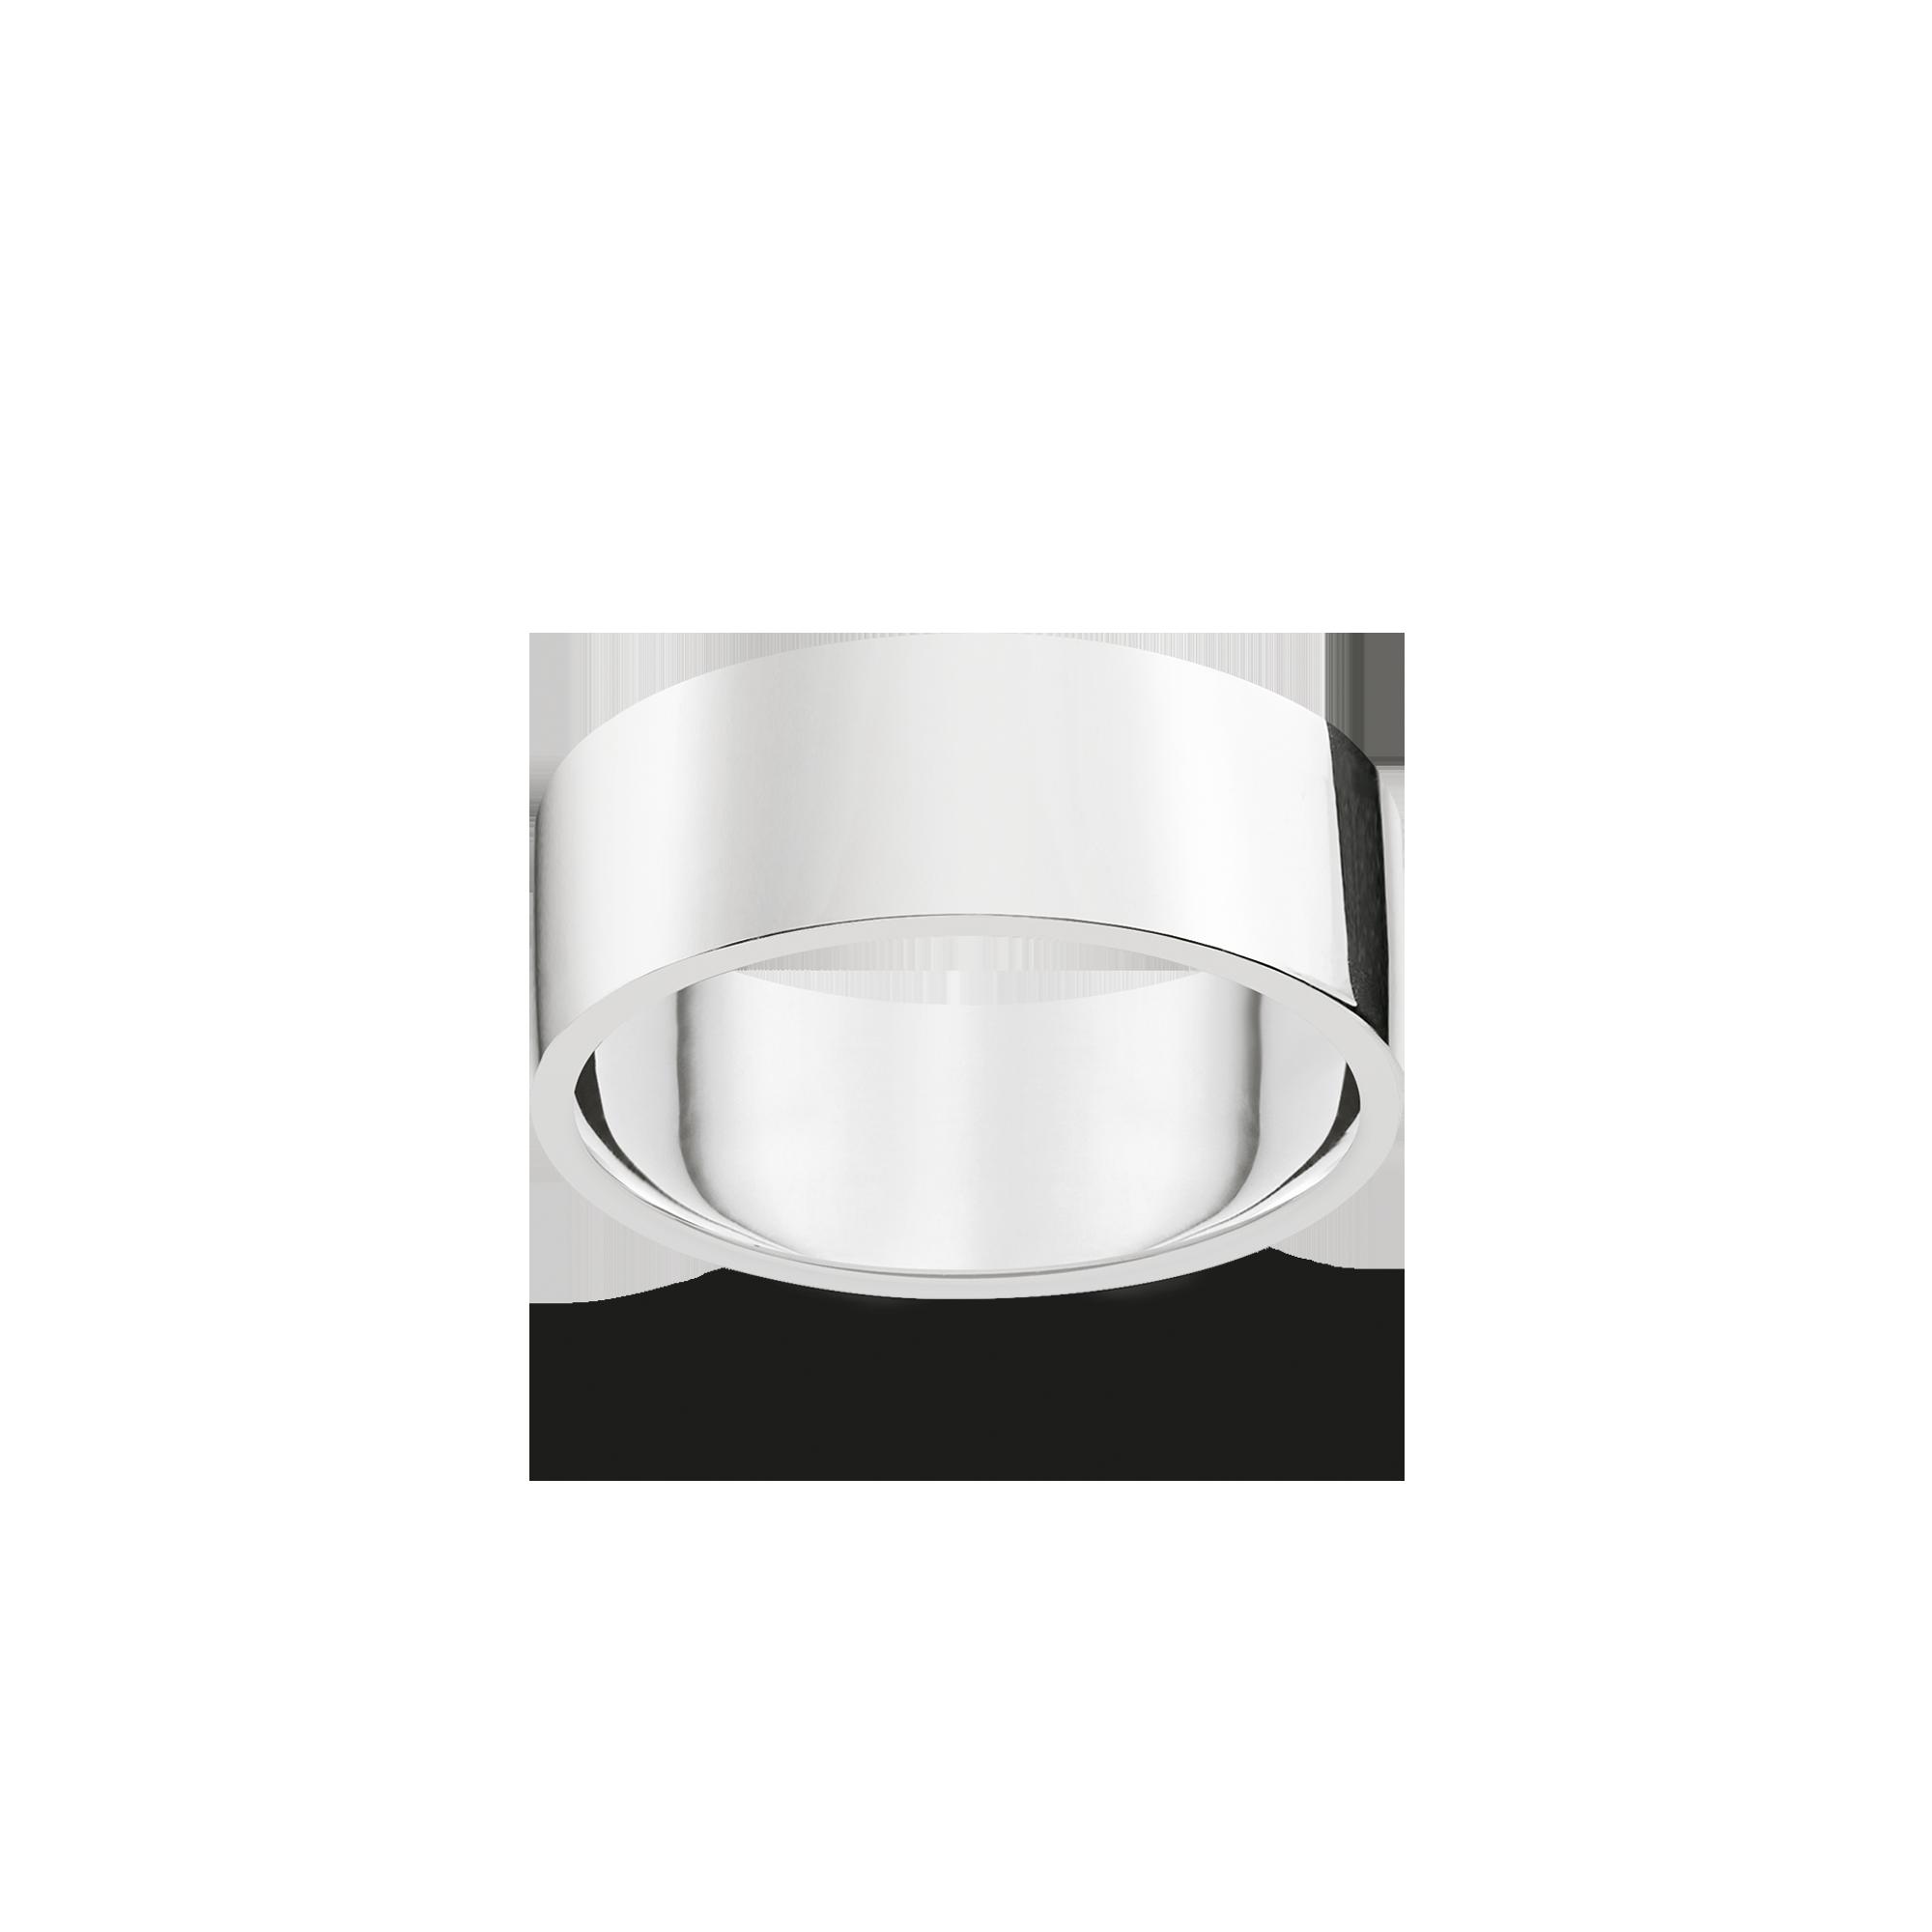 Thomas Sabo - personalised ring - 1